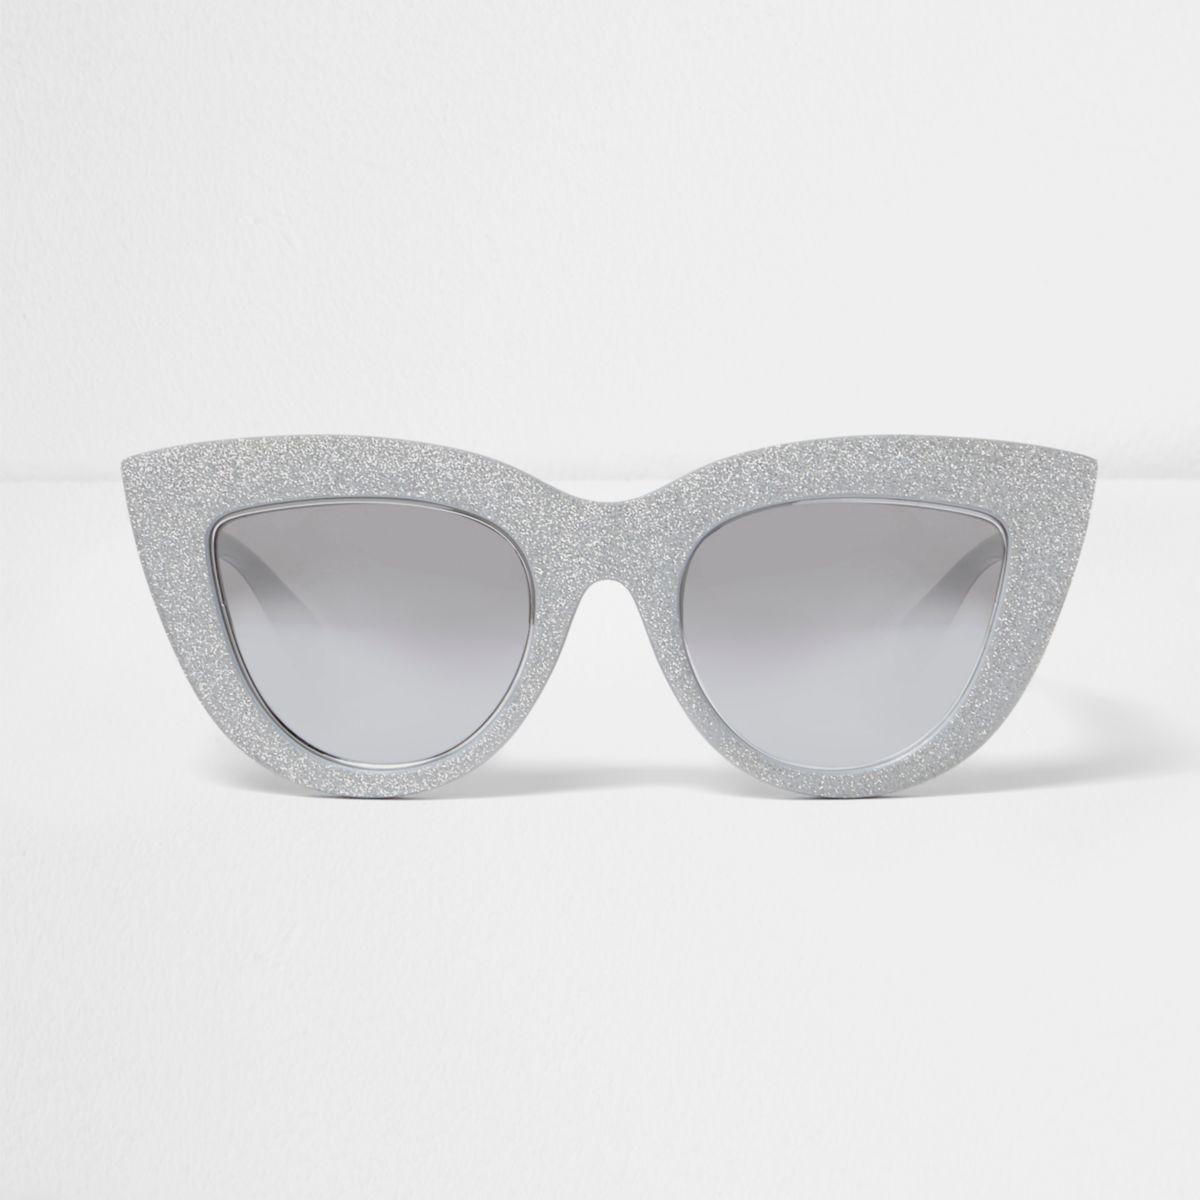 Silver glitter oversized cat eye sunglasses